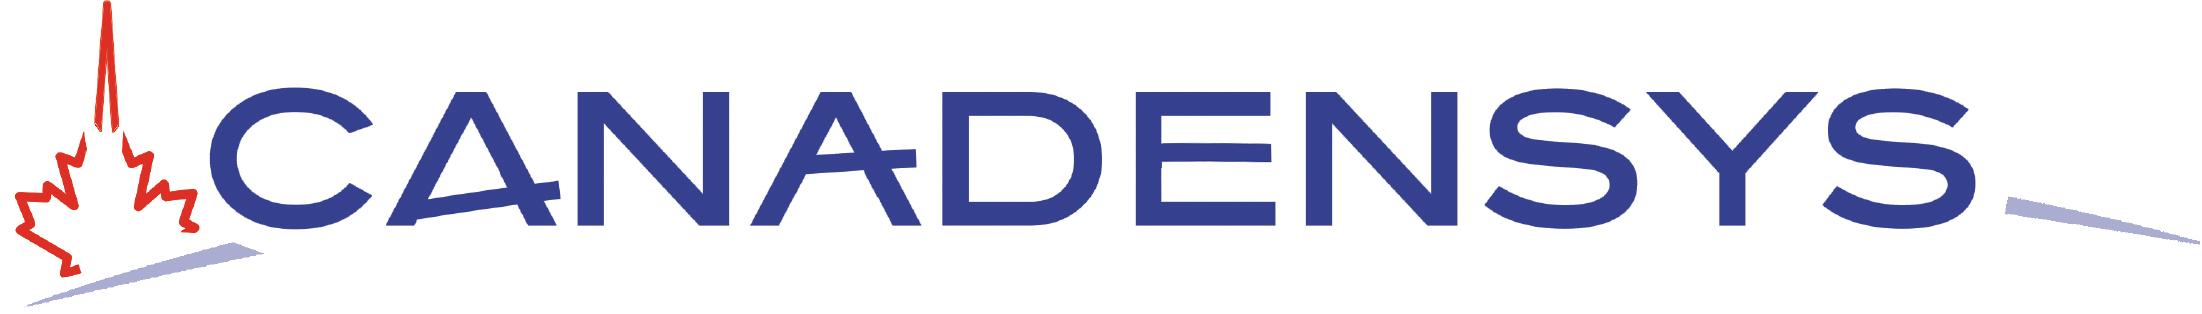 Canadensys-Logo.jpg